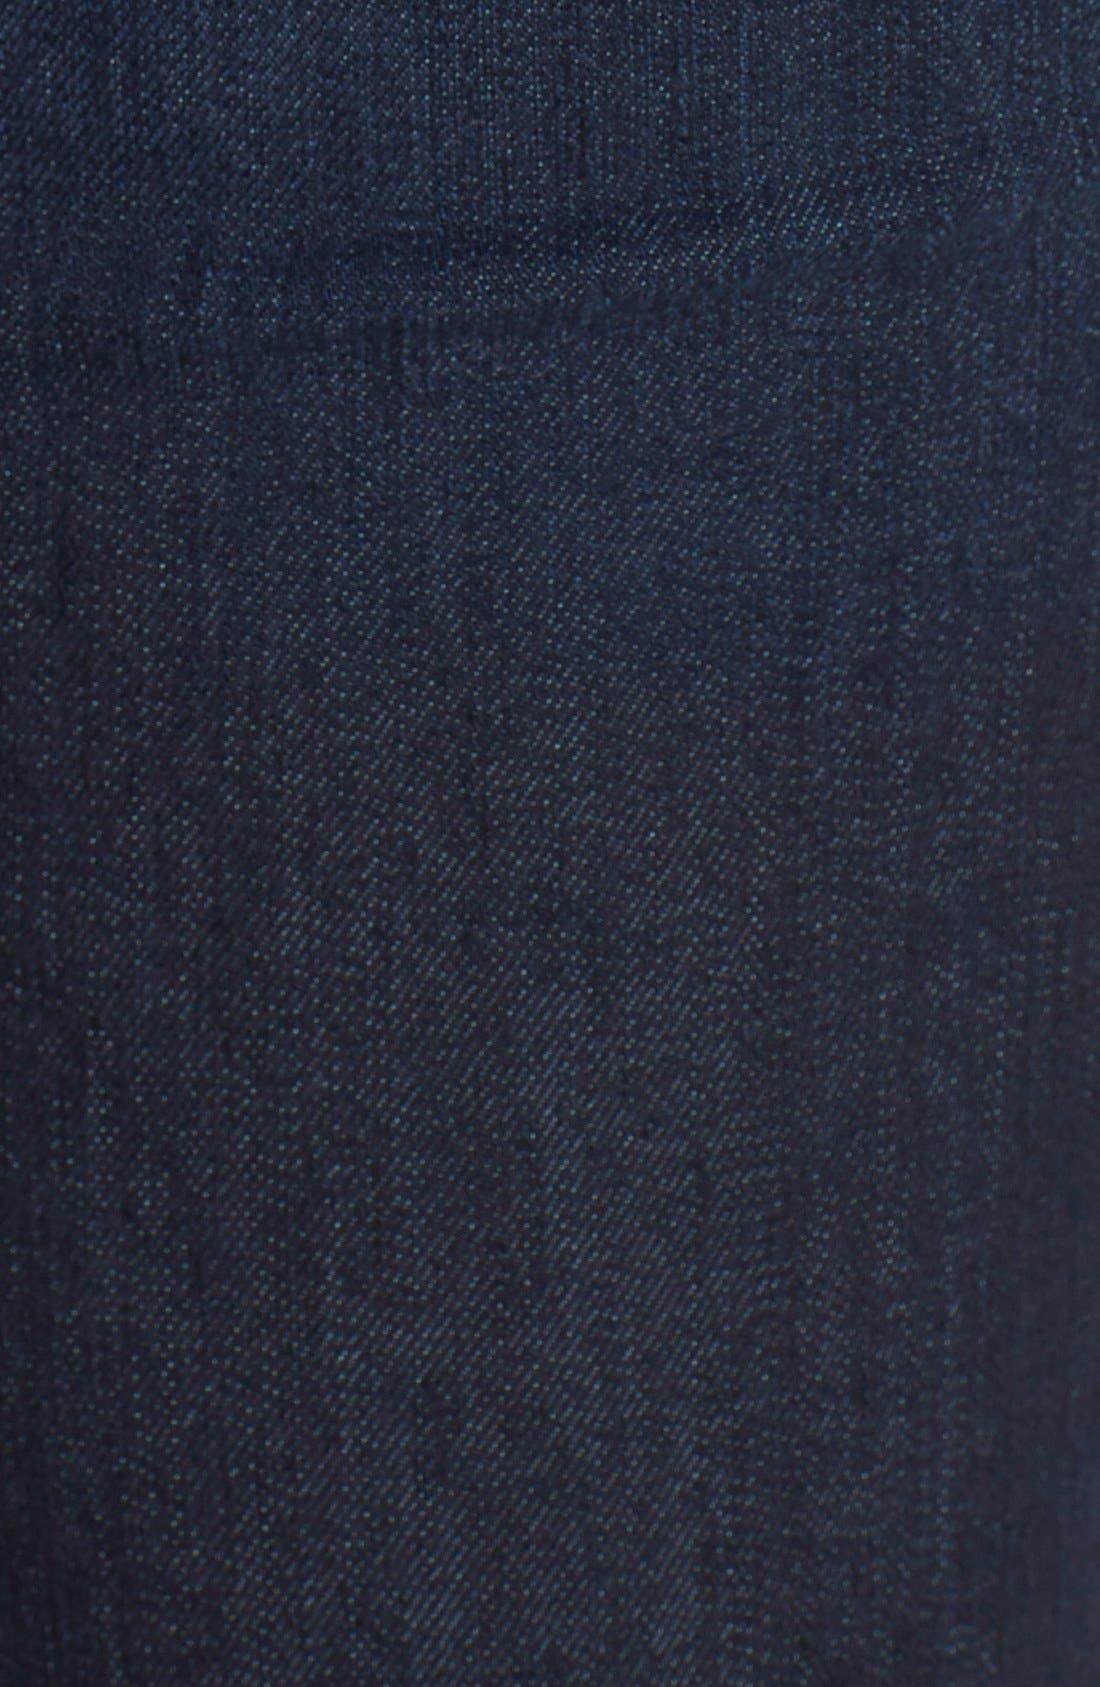 Low Rise Skinny Jeans,                             Alternate thumbnail 10, color,